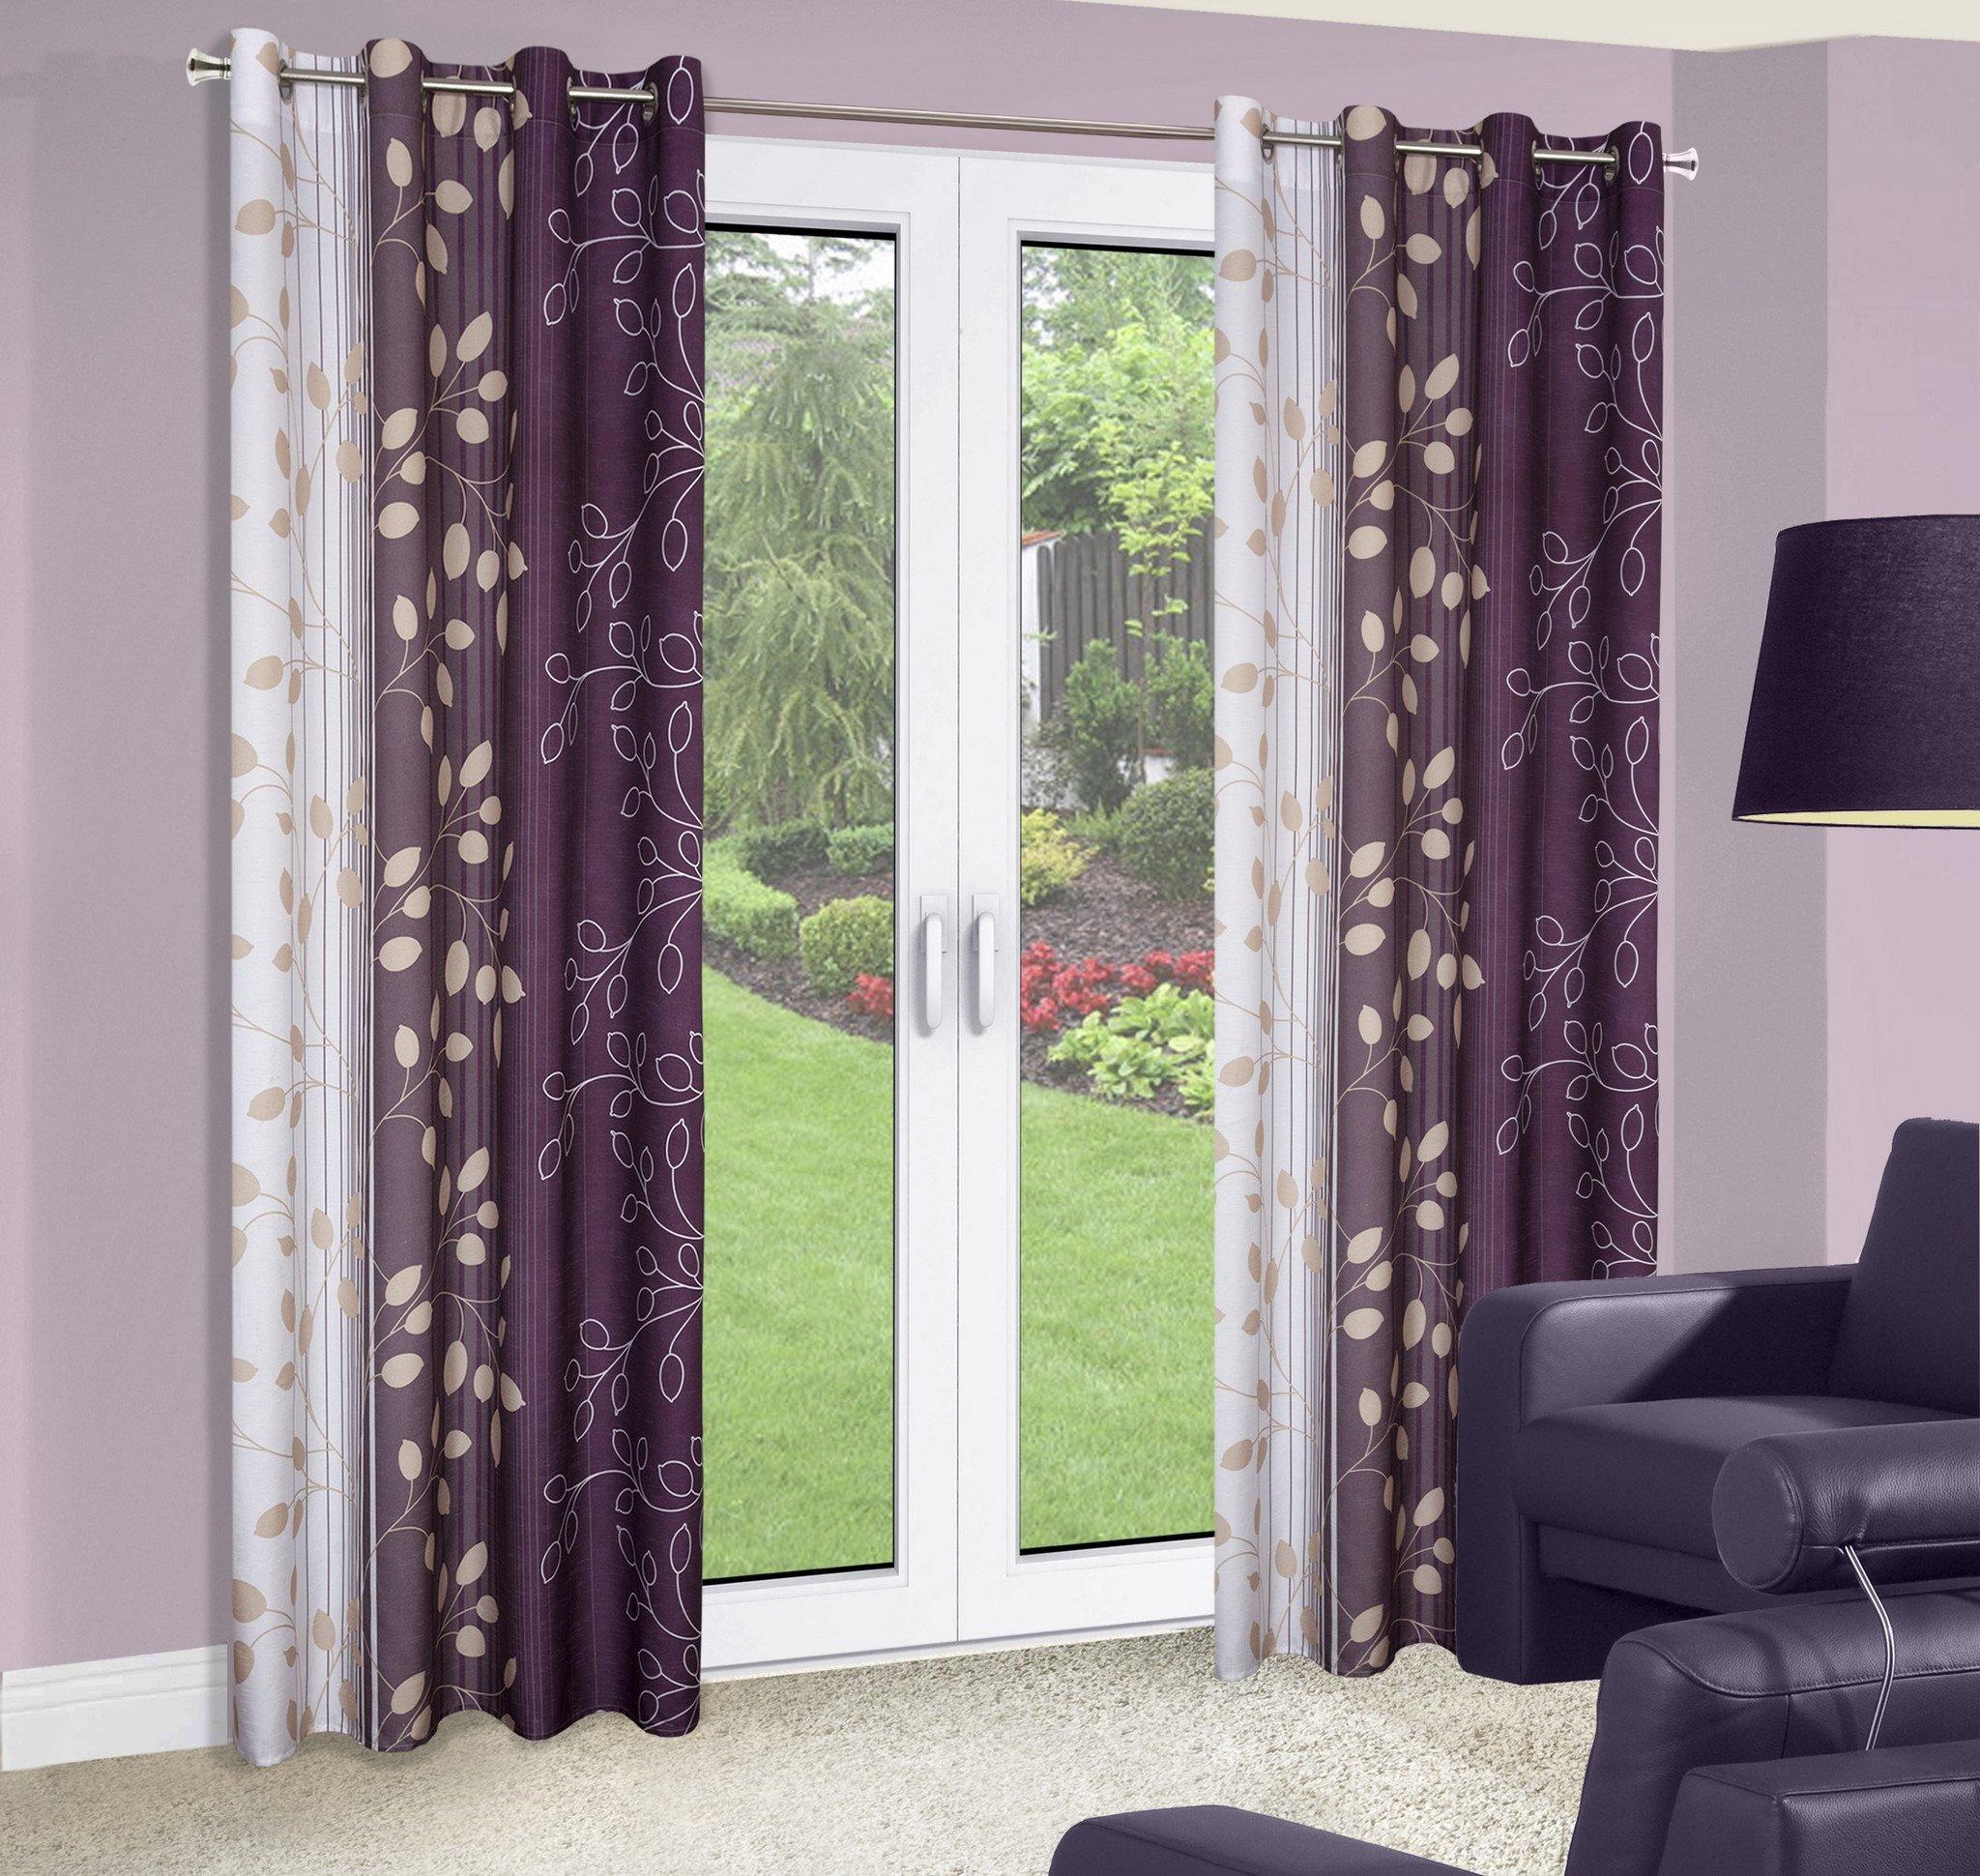 purple curtains marvelous curtains - purple - amazing curtains CLEYWJD